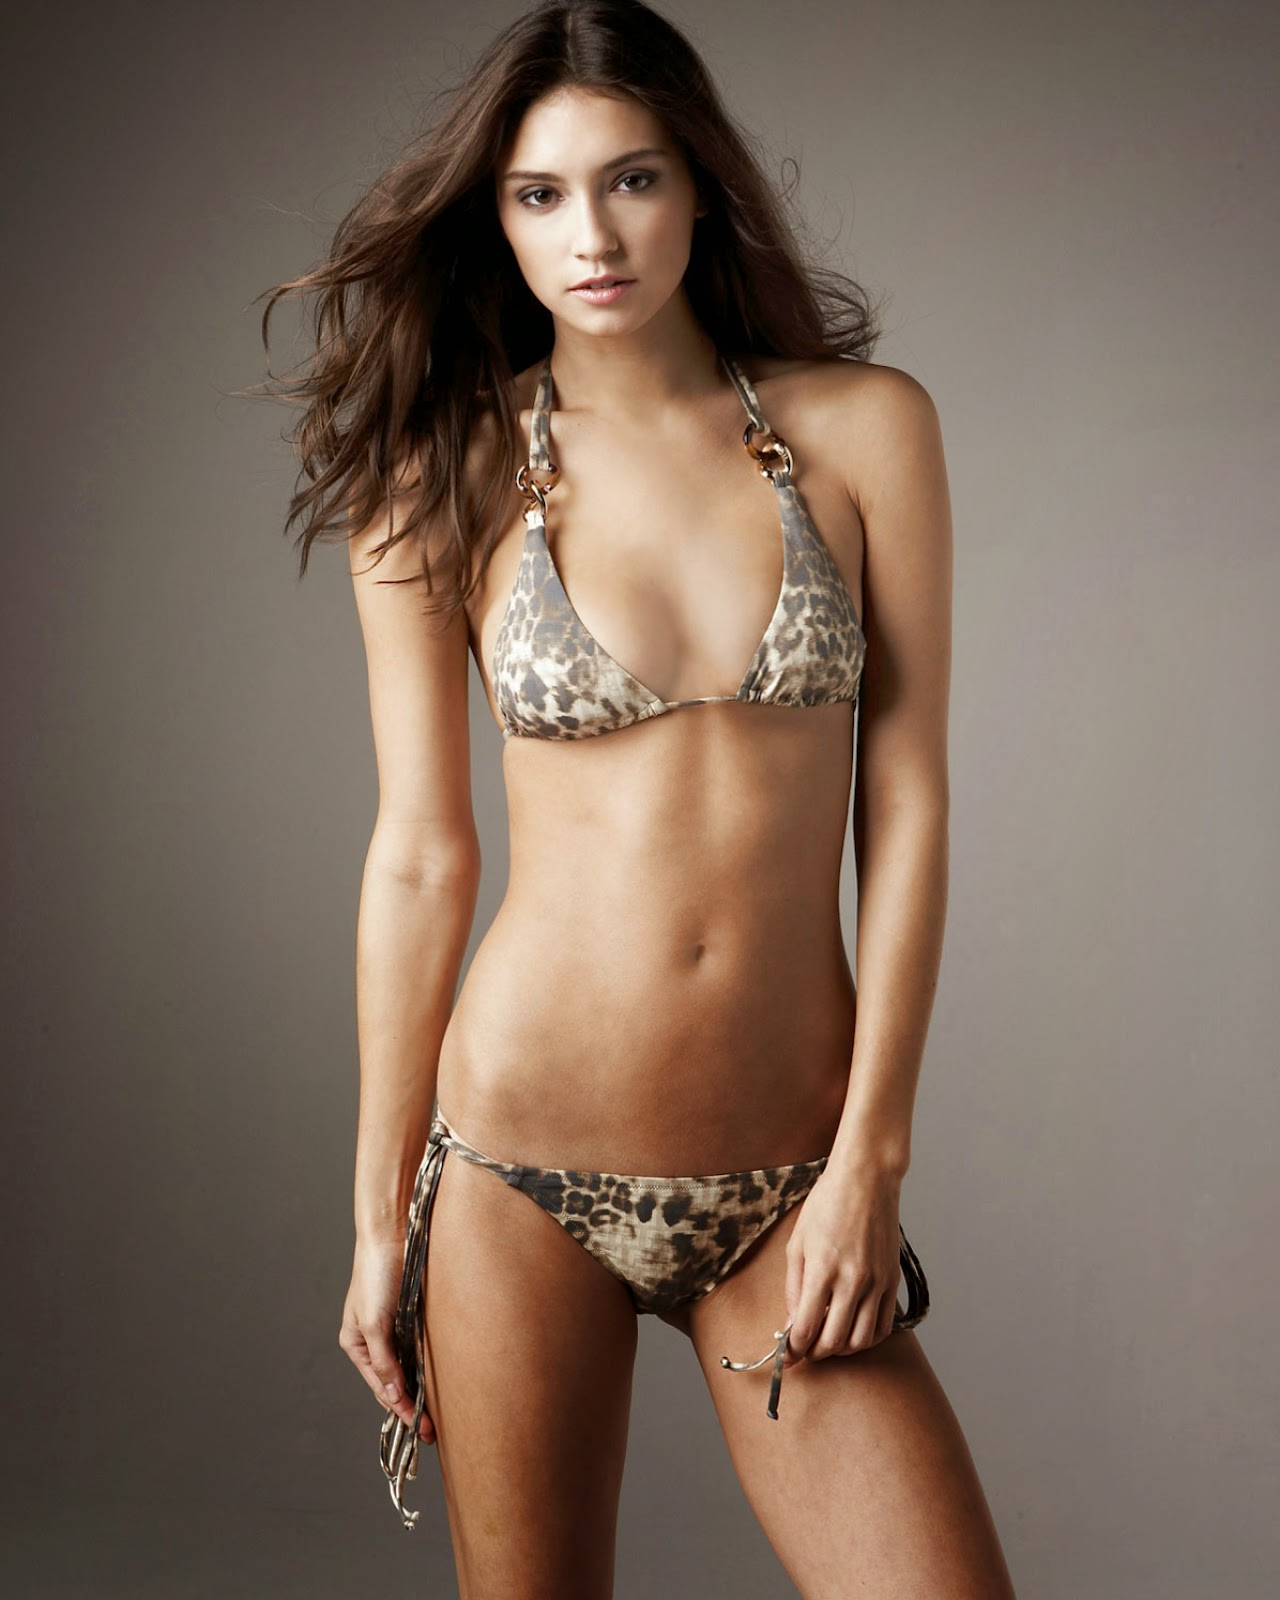 sexy bikini models thin